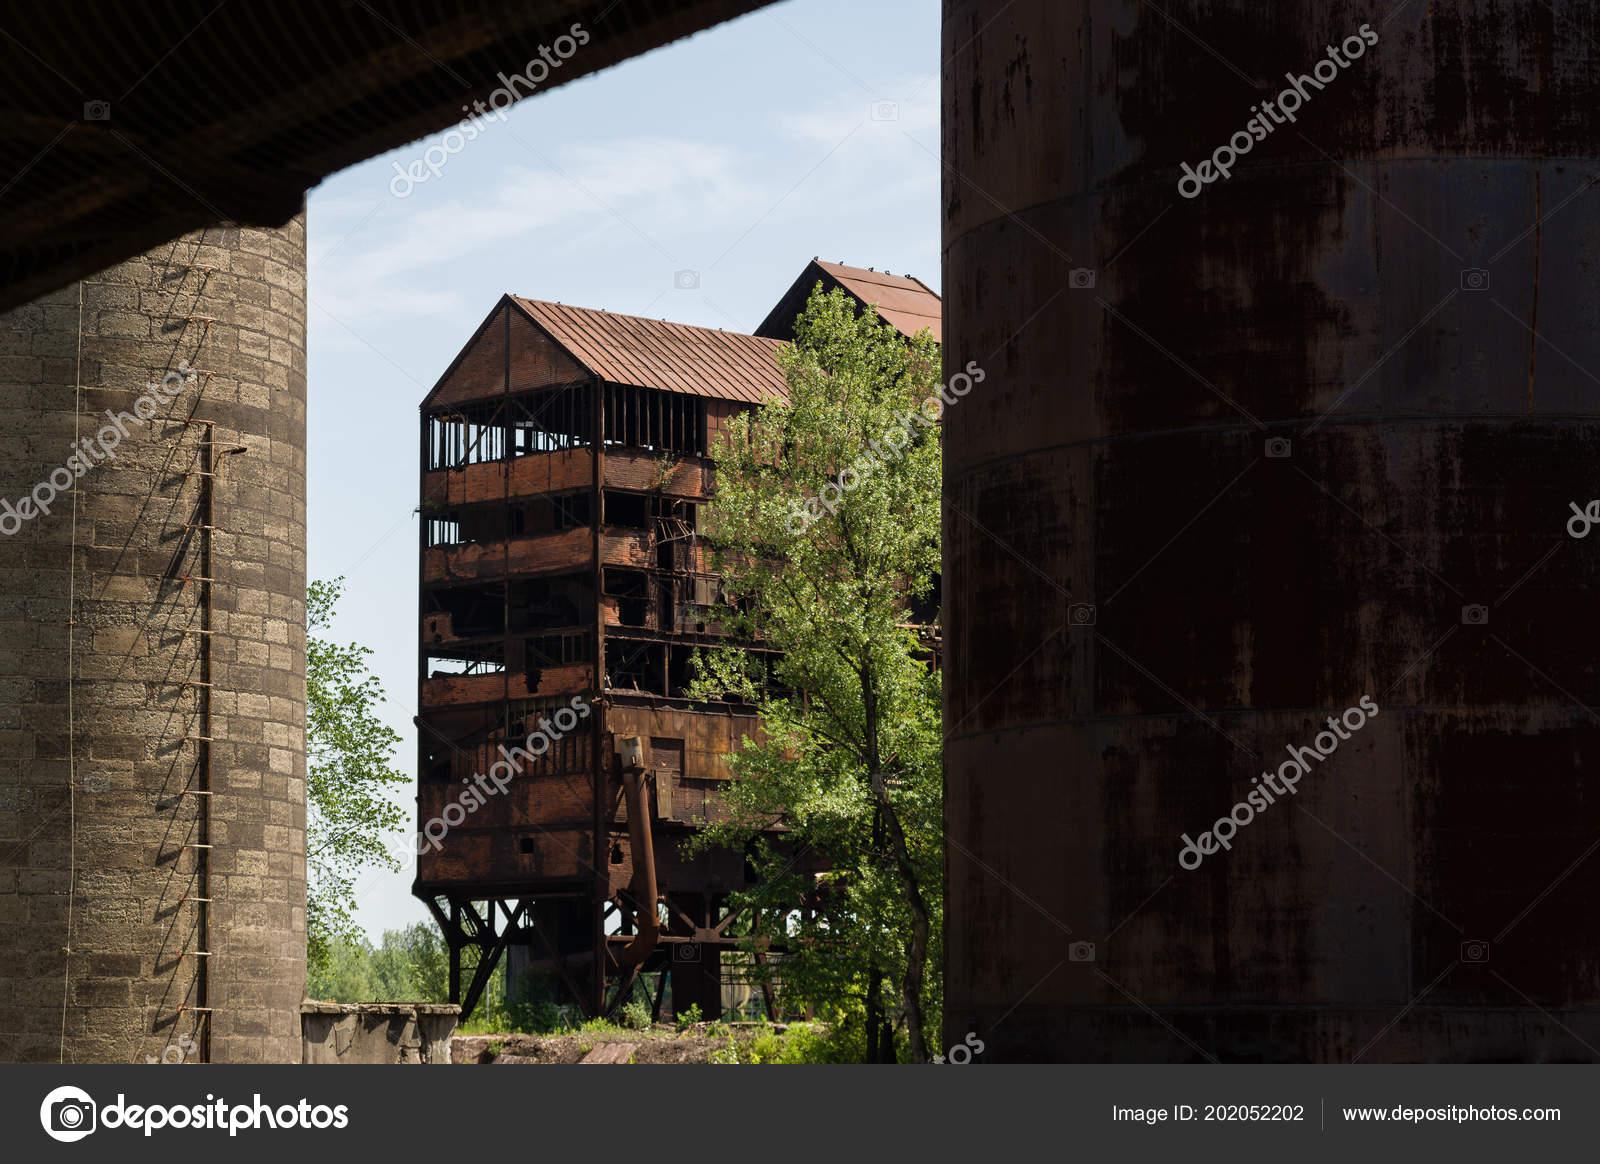 Abandoned Buildings Dolni Vitkovice Industrial Area Ostrava Czech Republic Stock Photo C Vidumg 202052202